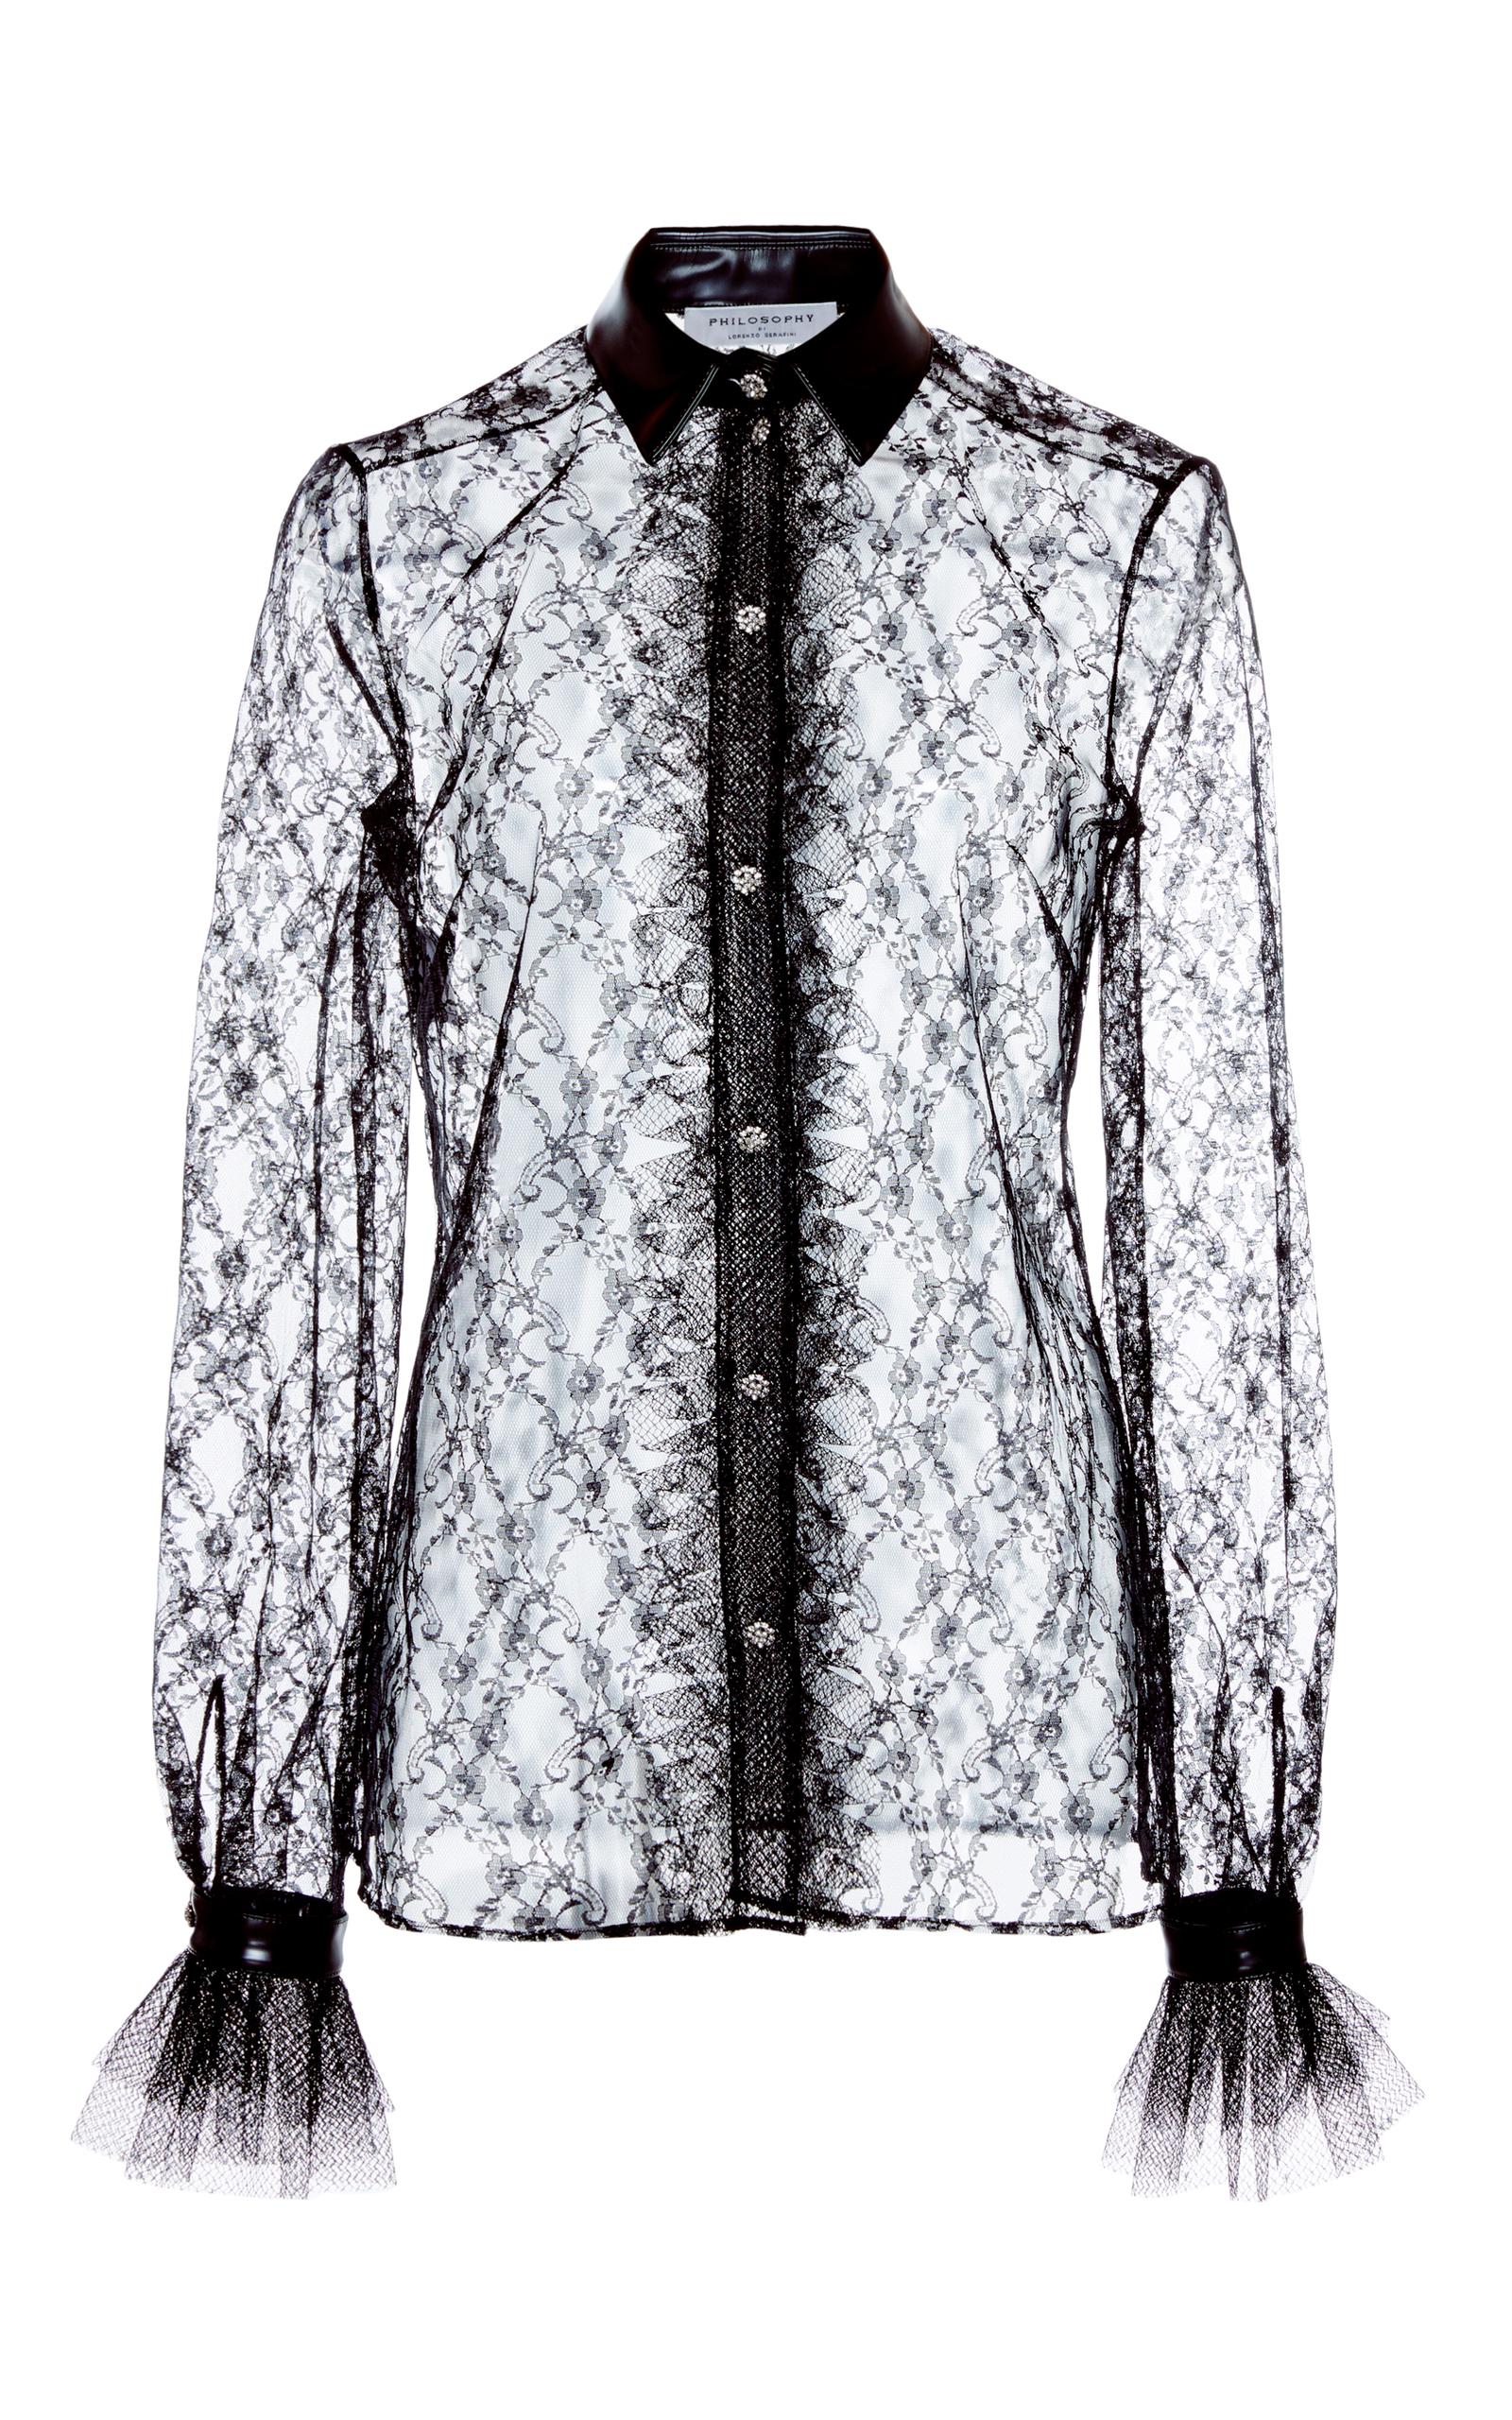 Lace Sheer Button Up Blouse By Philosophy Di Lorenzo Moda Operandi